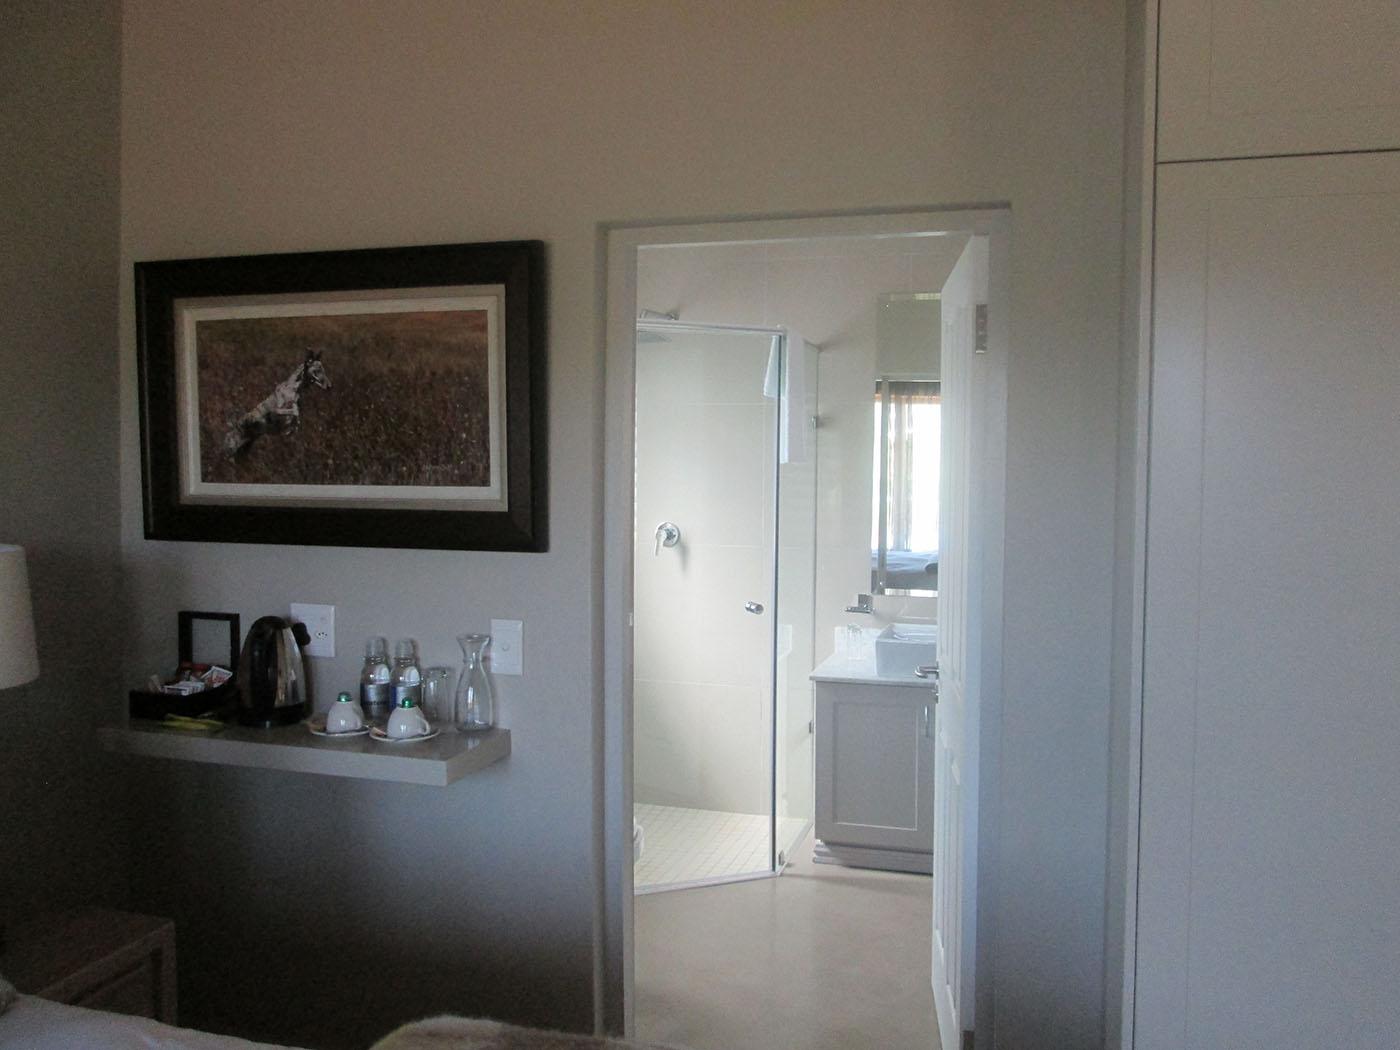 18th-hole-rooms-luxury-accommodation-drakensberg-midlands-kzn-Nottingham-Road-gowrie-farm